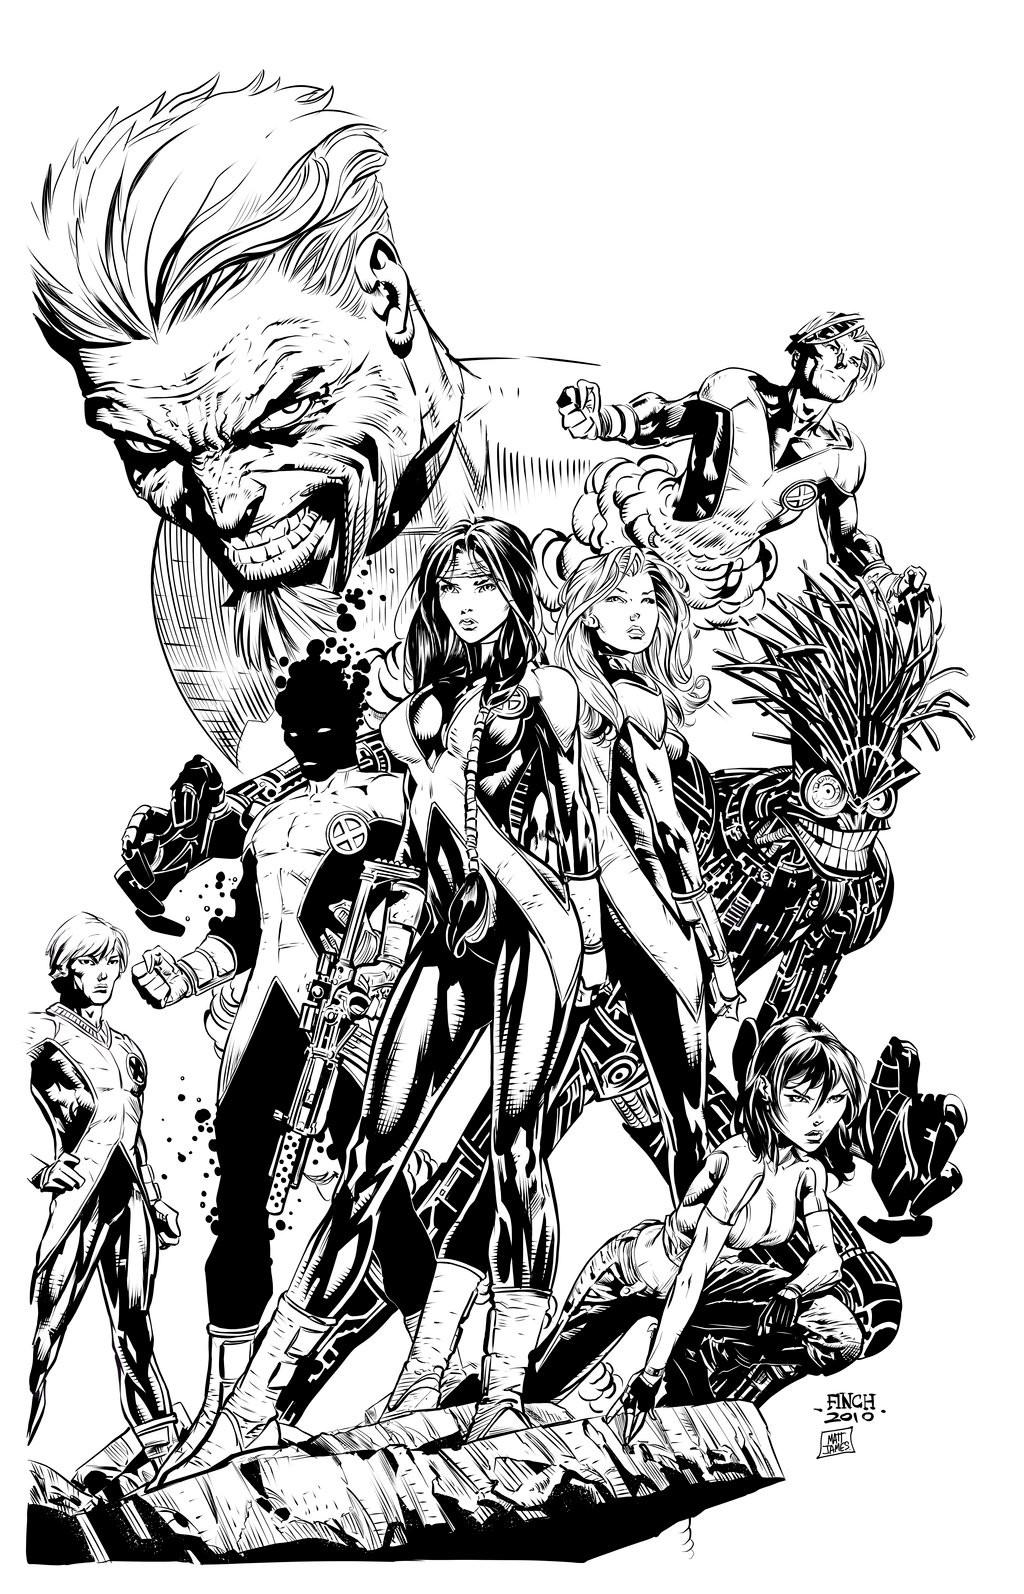 Matt james new mutants 12 cover fan inks by snakebitartstudio dbzg5u2